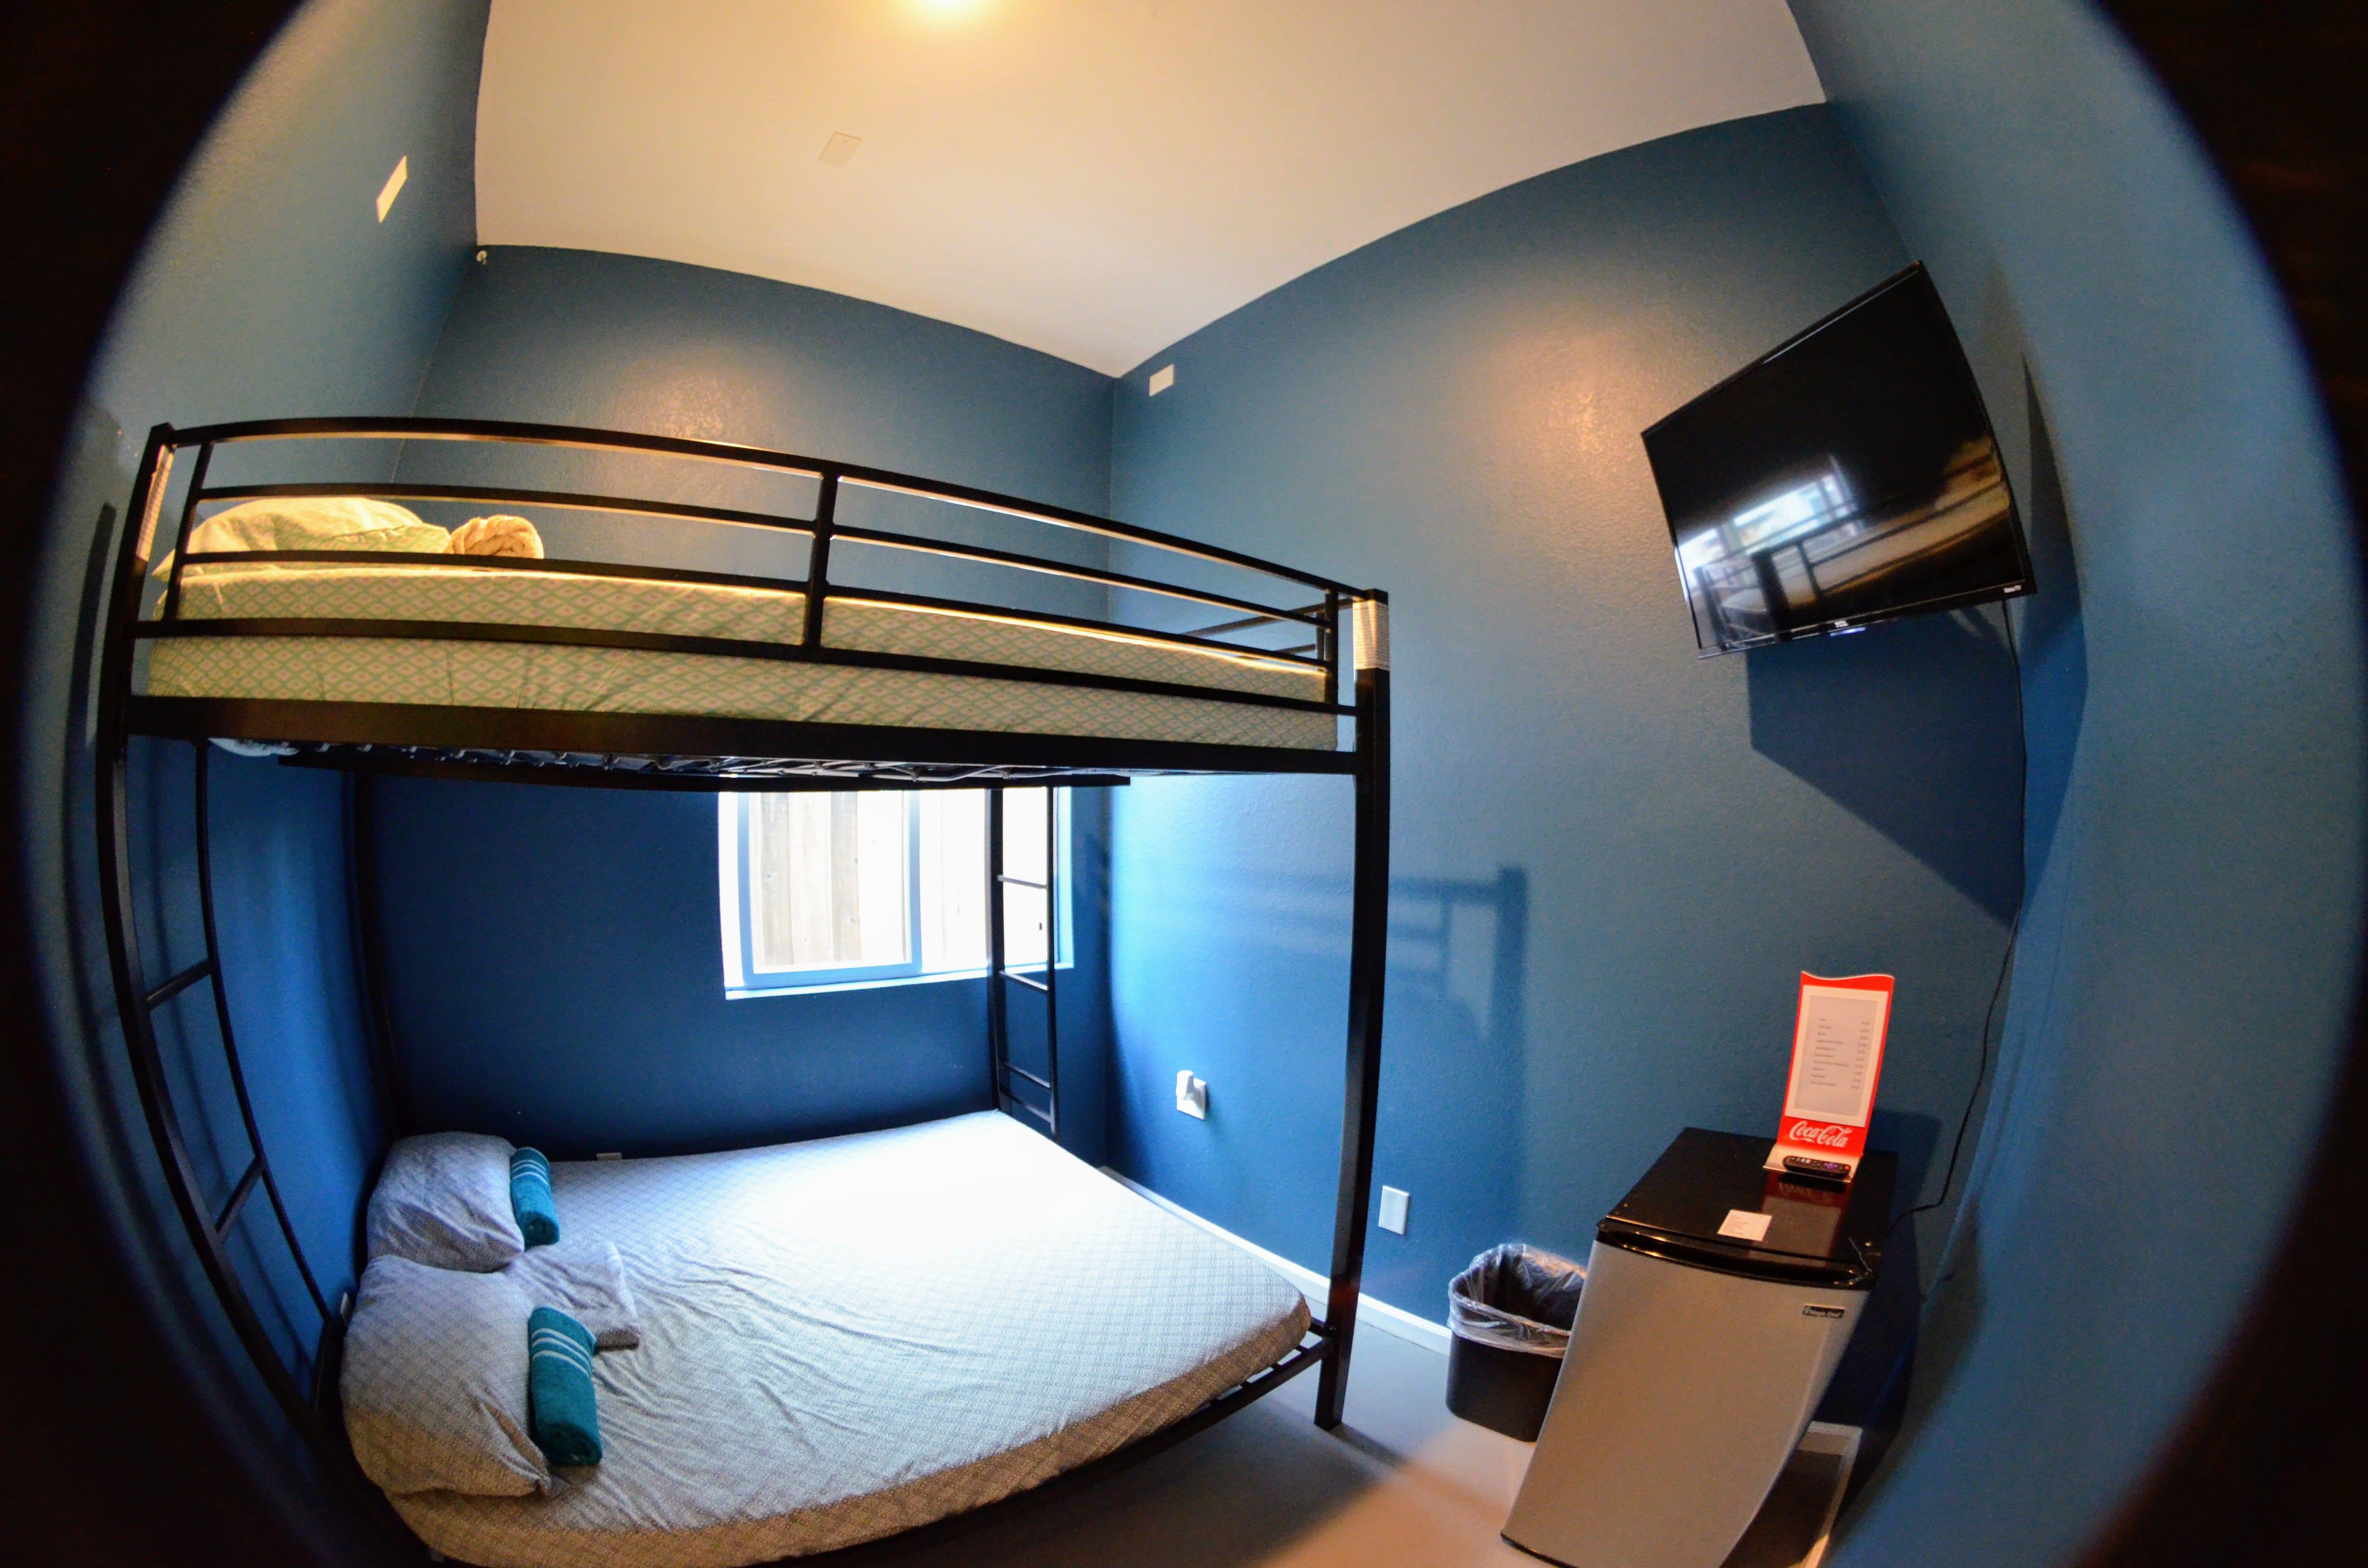 HOSTEL - California Dreams Hostel